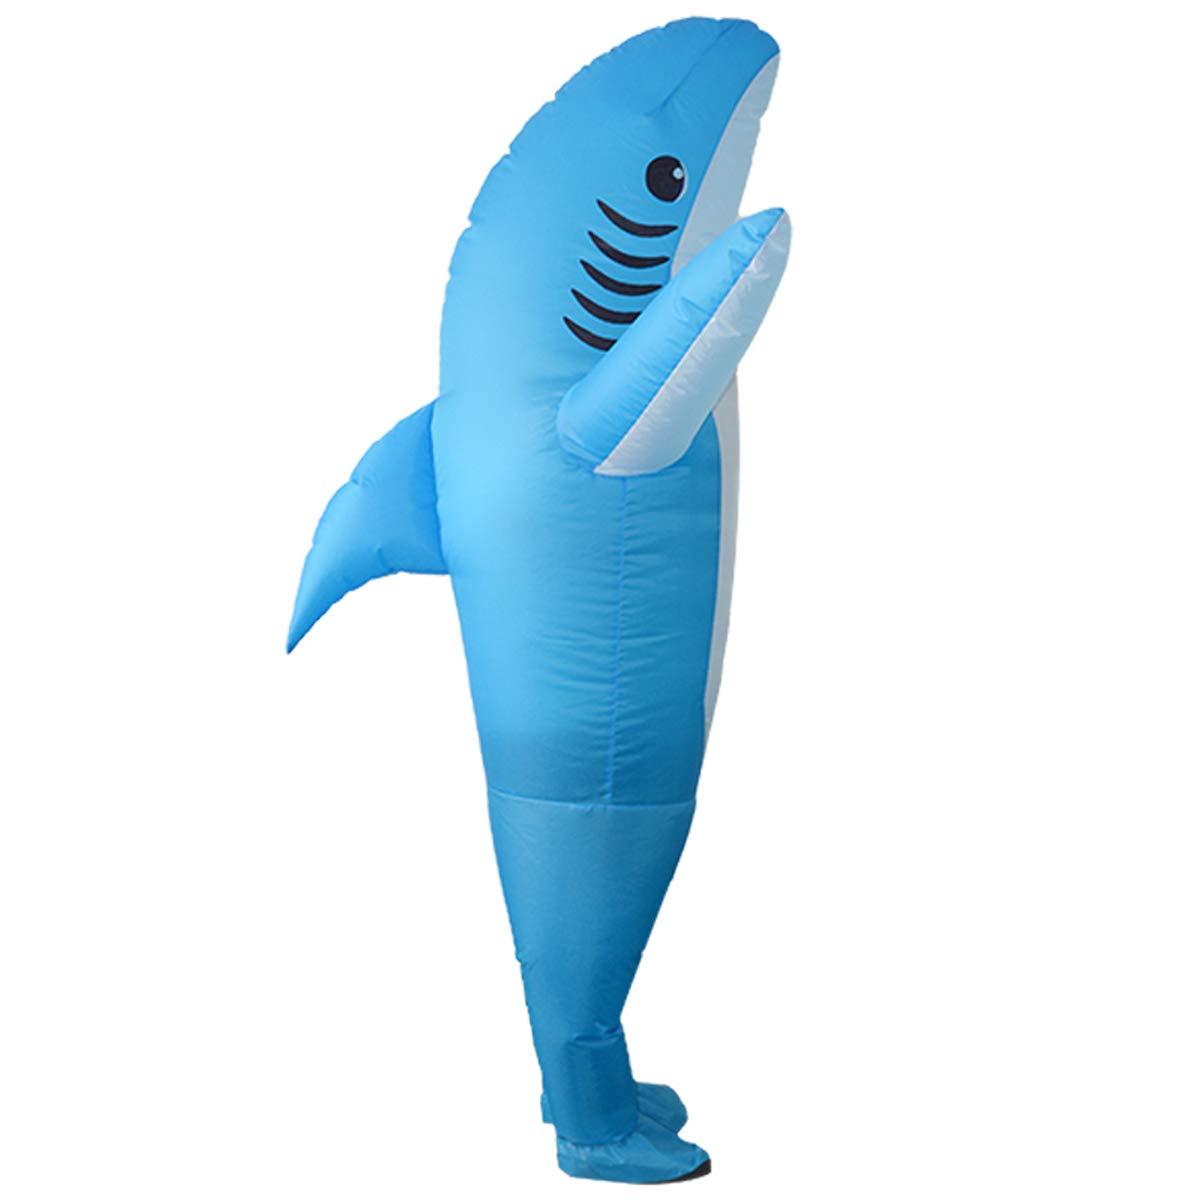 Amazon.com: Disfraz de halloween inflable unisex de tiburón ...